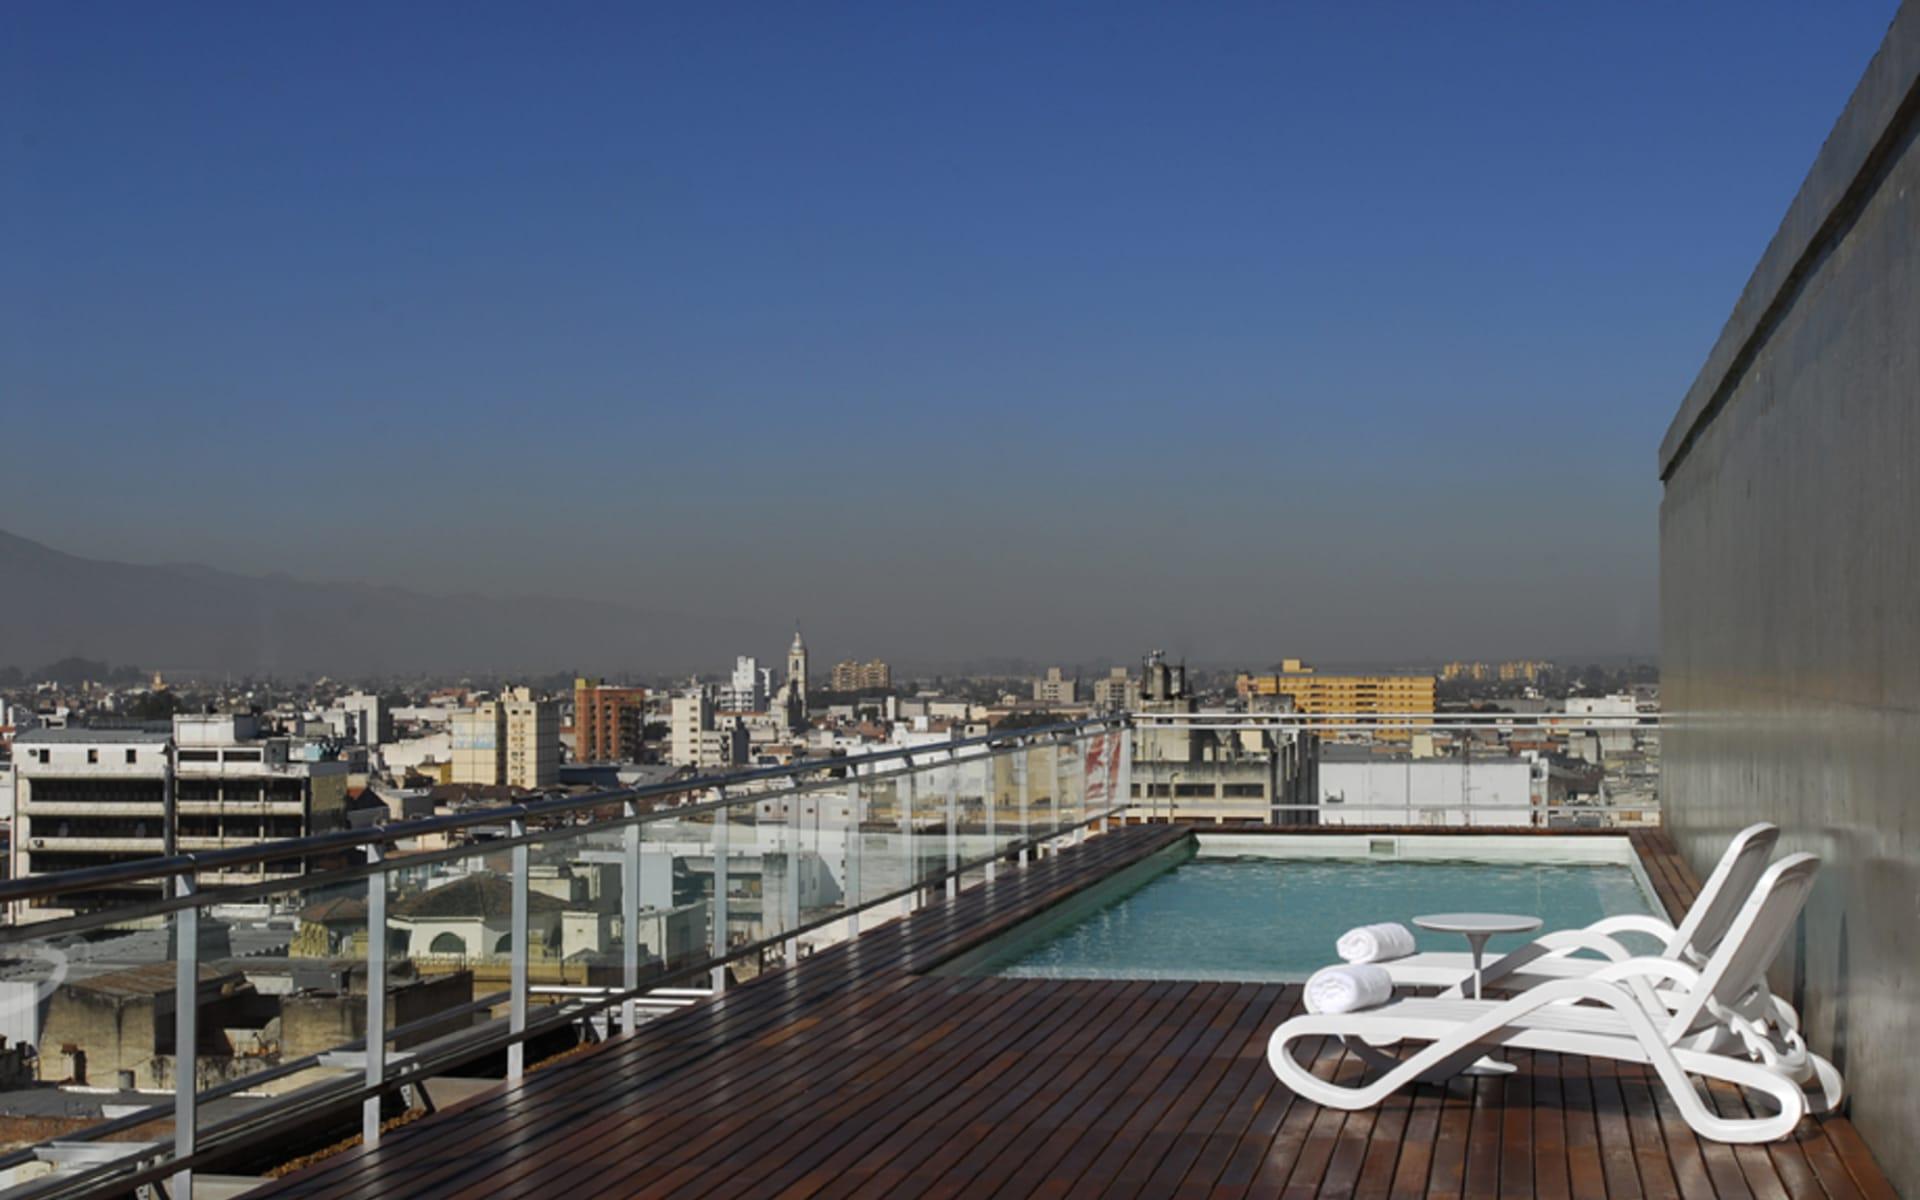 Design Suites Salta: Desing Salta- swimming pool